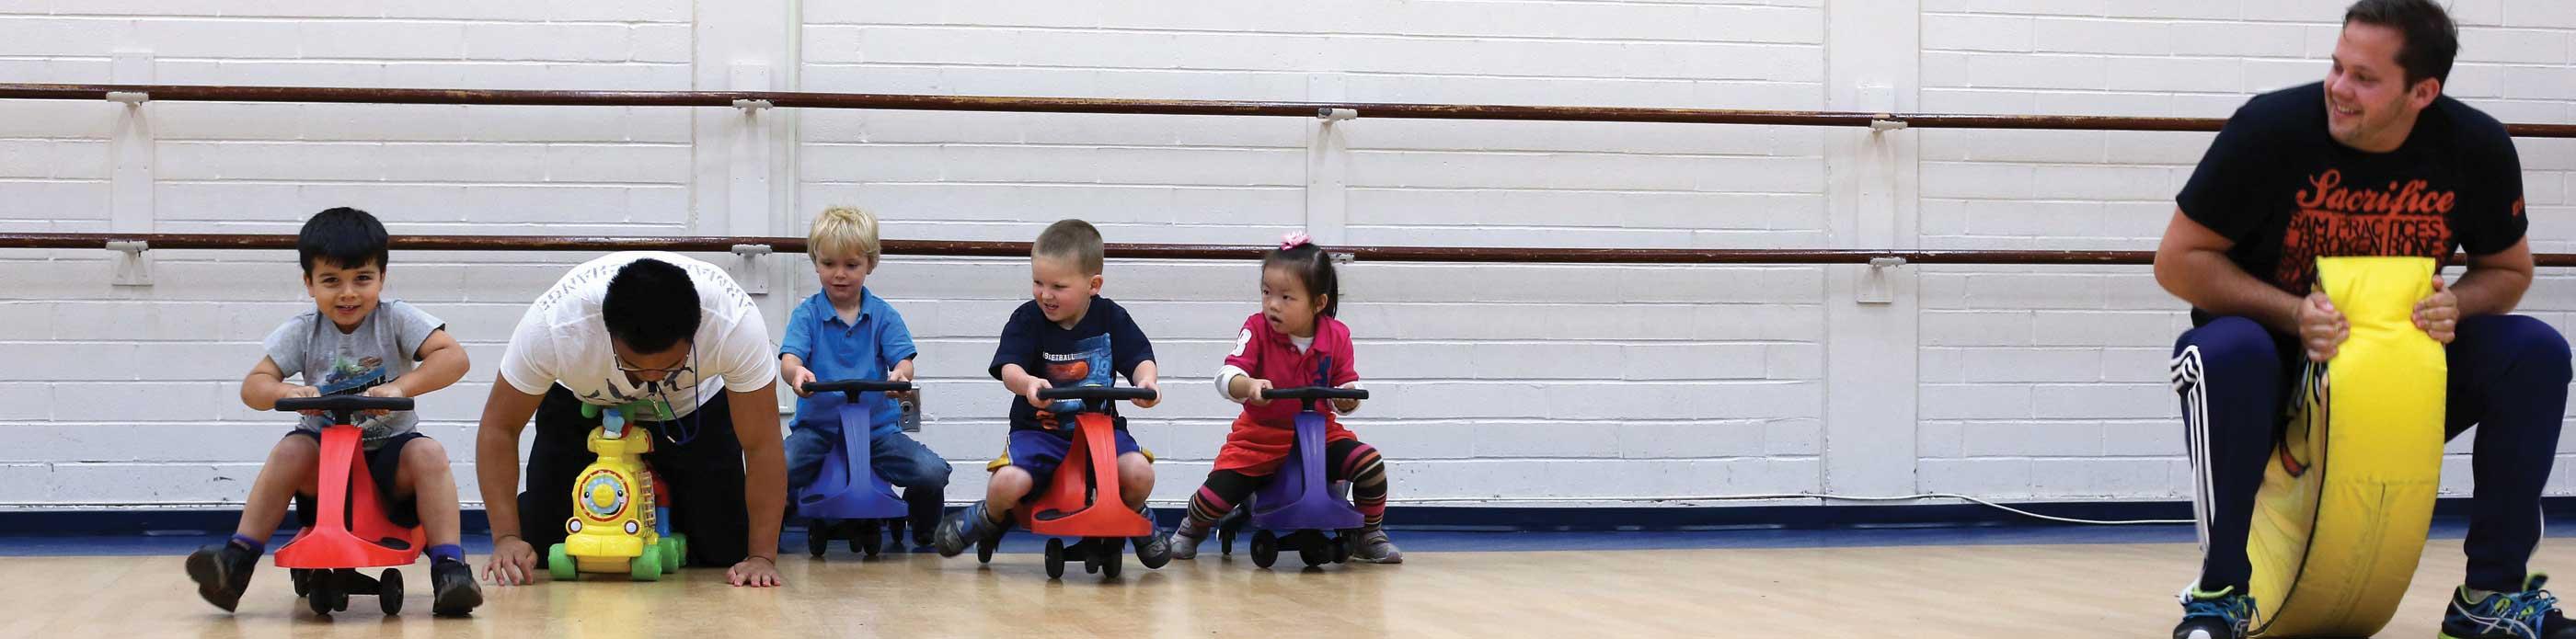 preschool-sports